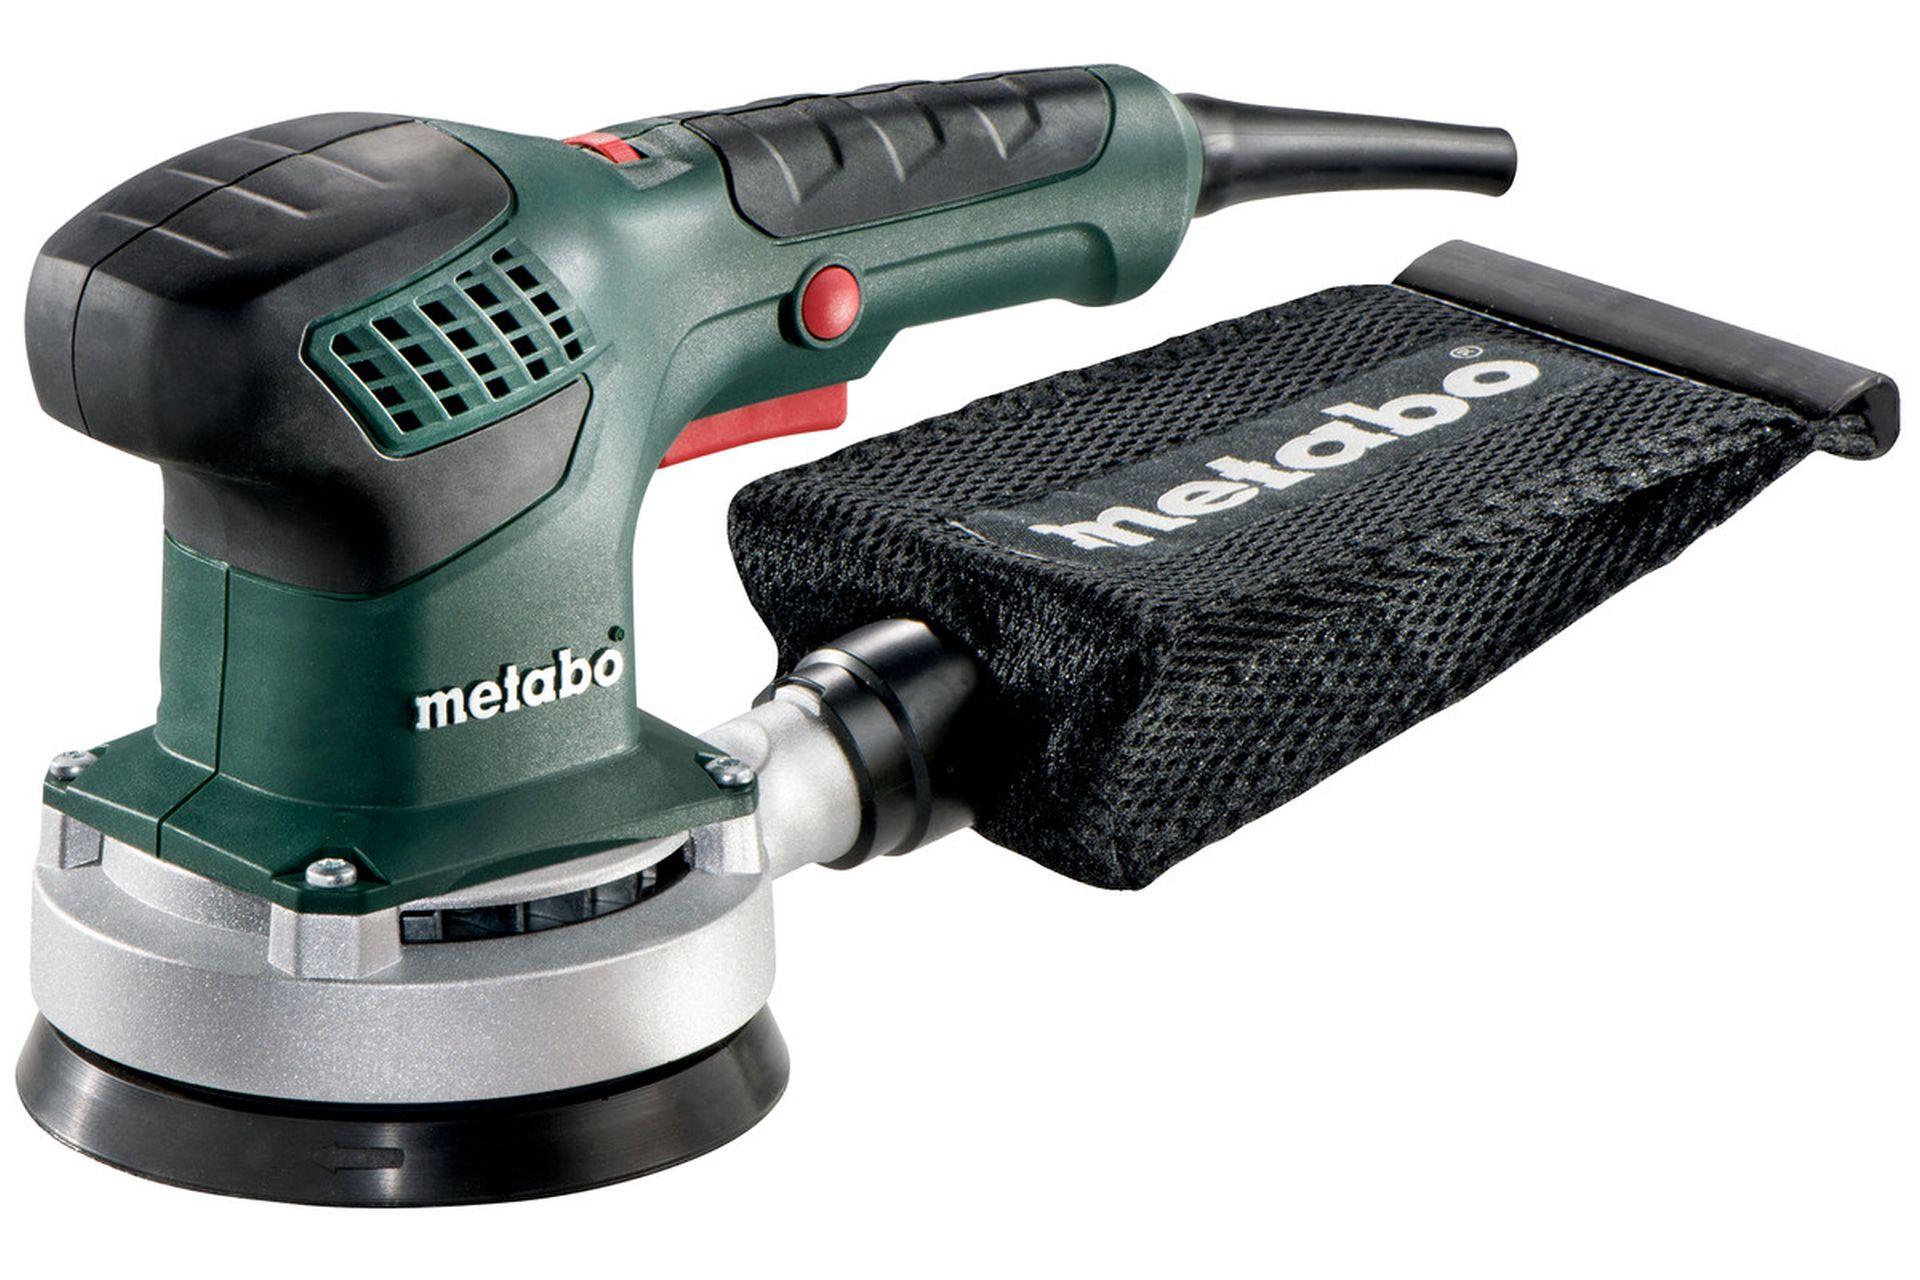 Metabo 600443000 SXE 3125 Excentrická bruska, 310W, 125 mm